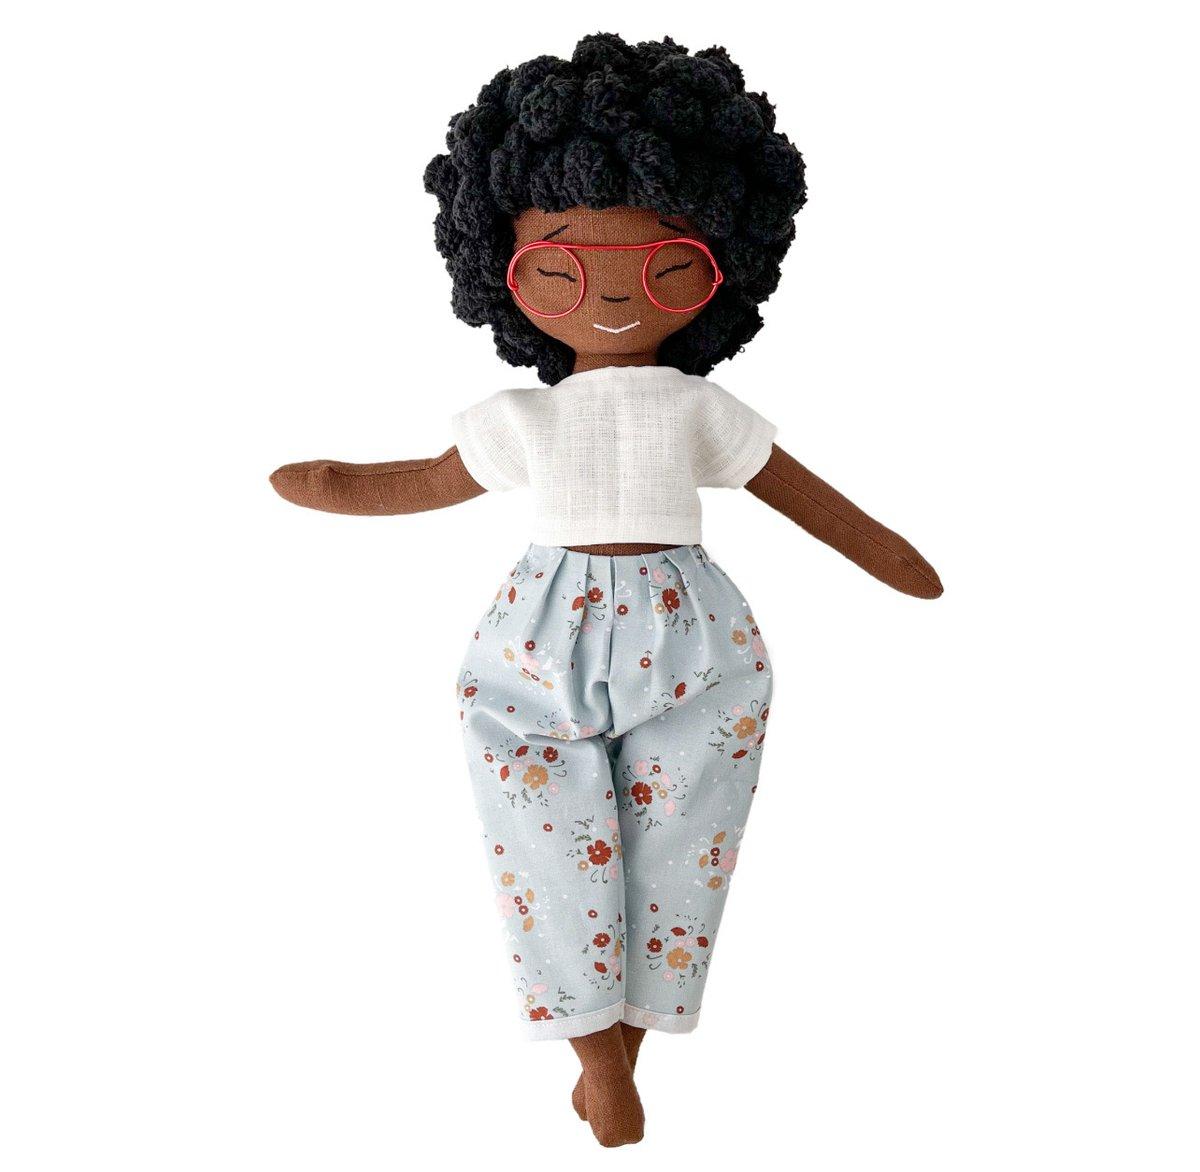 Mya More to Love Handmade Linen Doll(Waitlist Preorder Item-ship date Oct 1-Mar 30,2022)